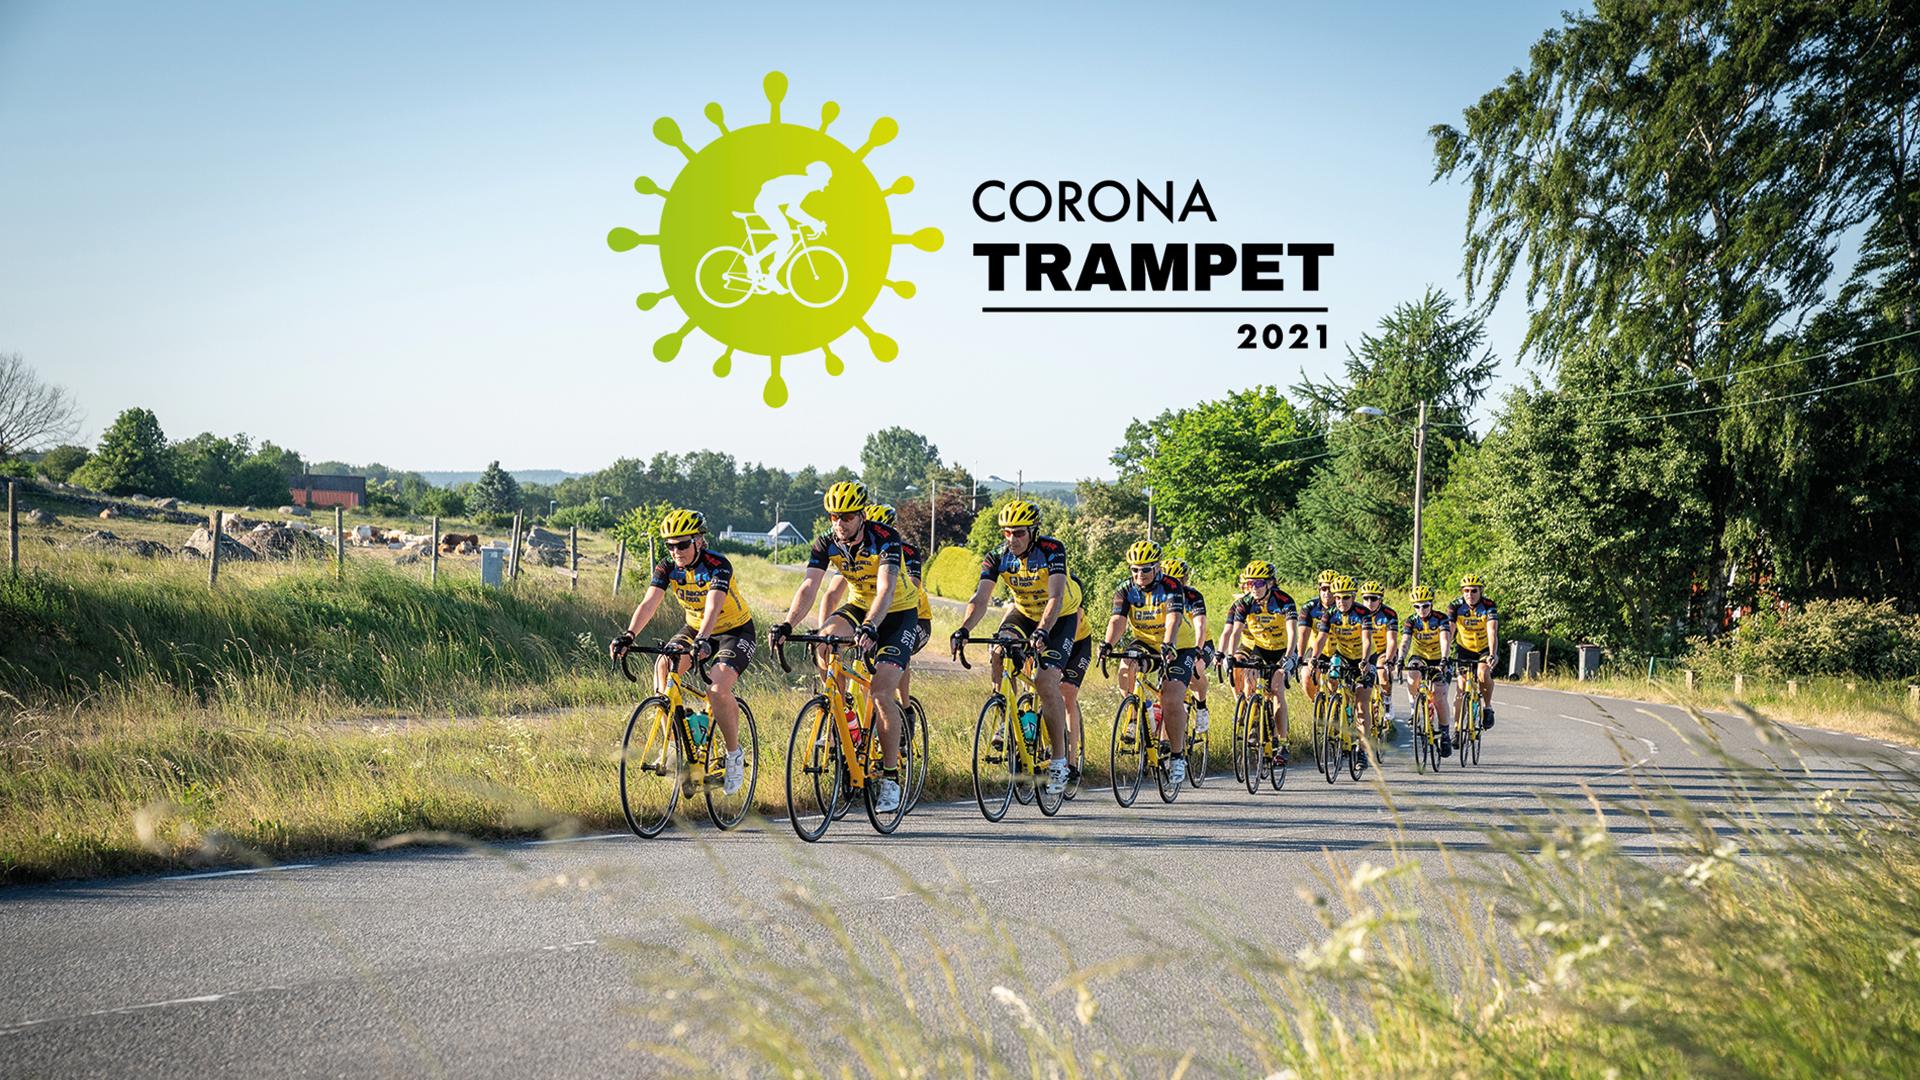 Coronatrampet - 100km